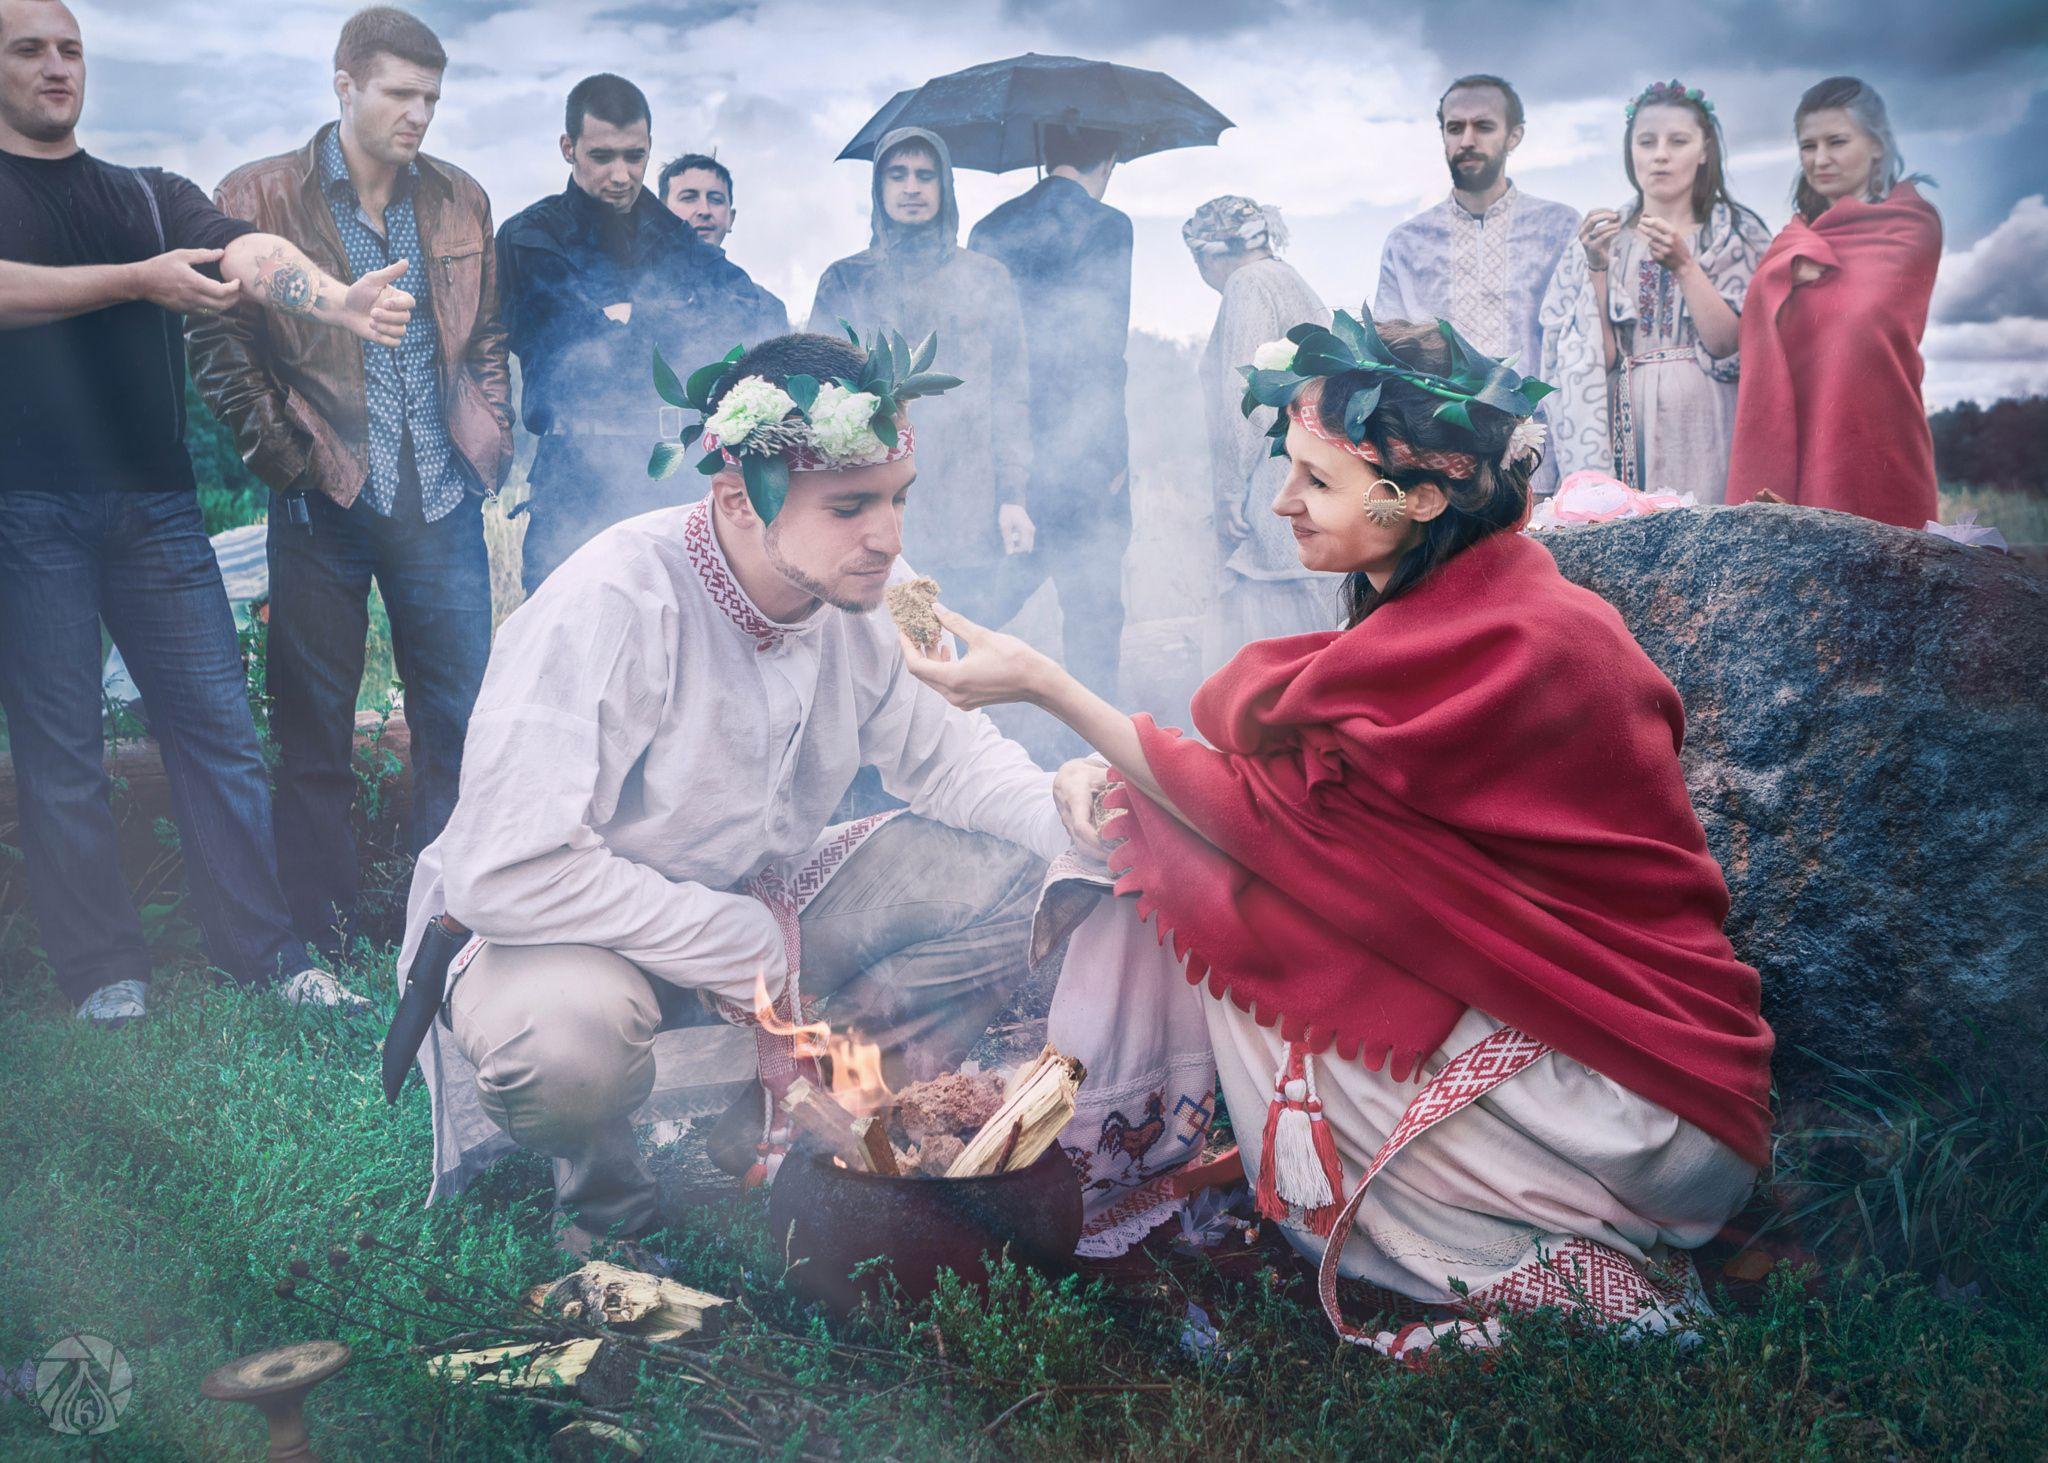 Рagan wedding by Константин Лучезарный on 500px